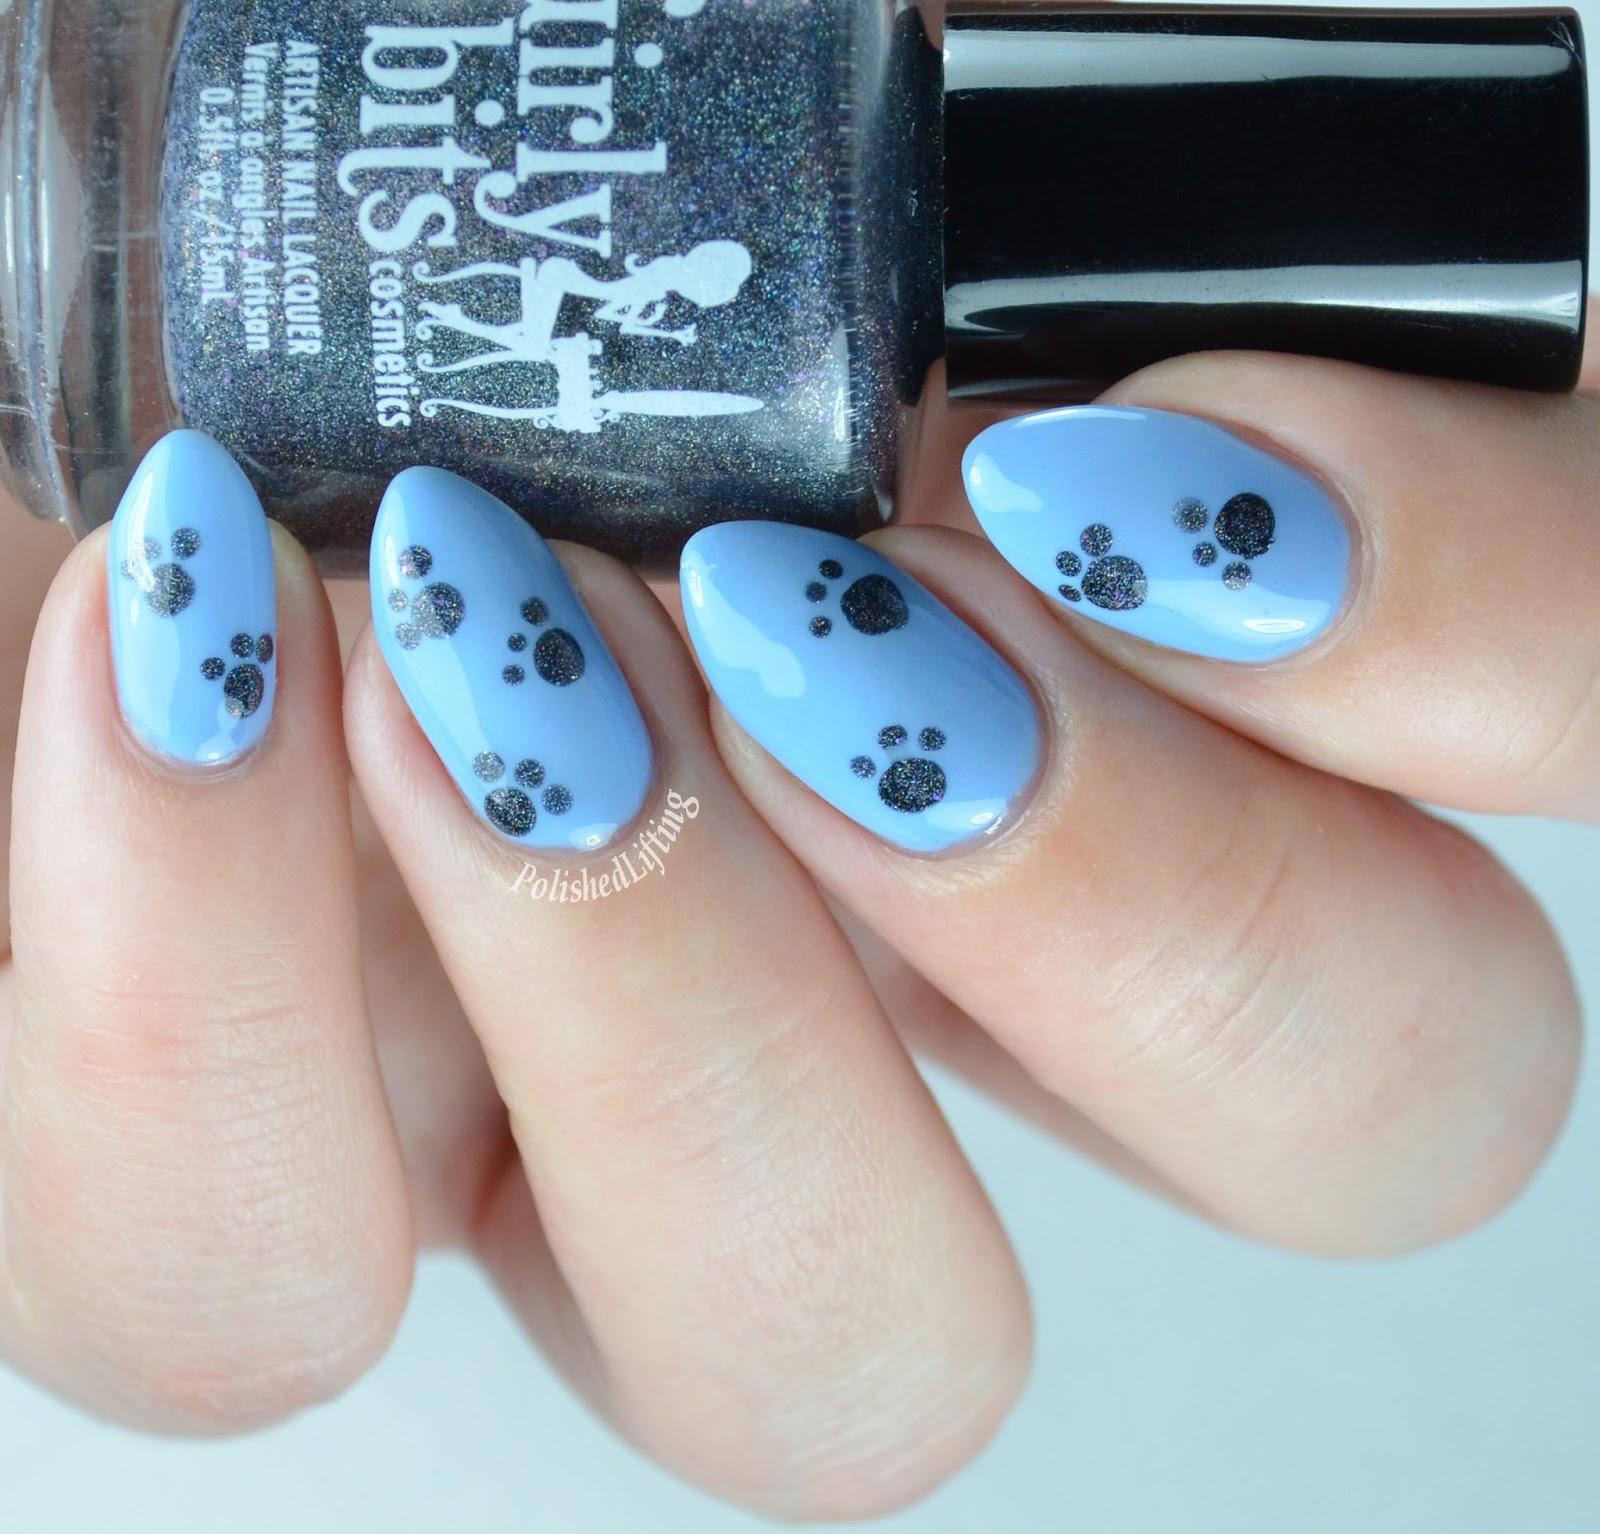 Polished Lifting: Twin Paw Print Nail Art with Nichole of Bedlam Beauty